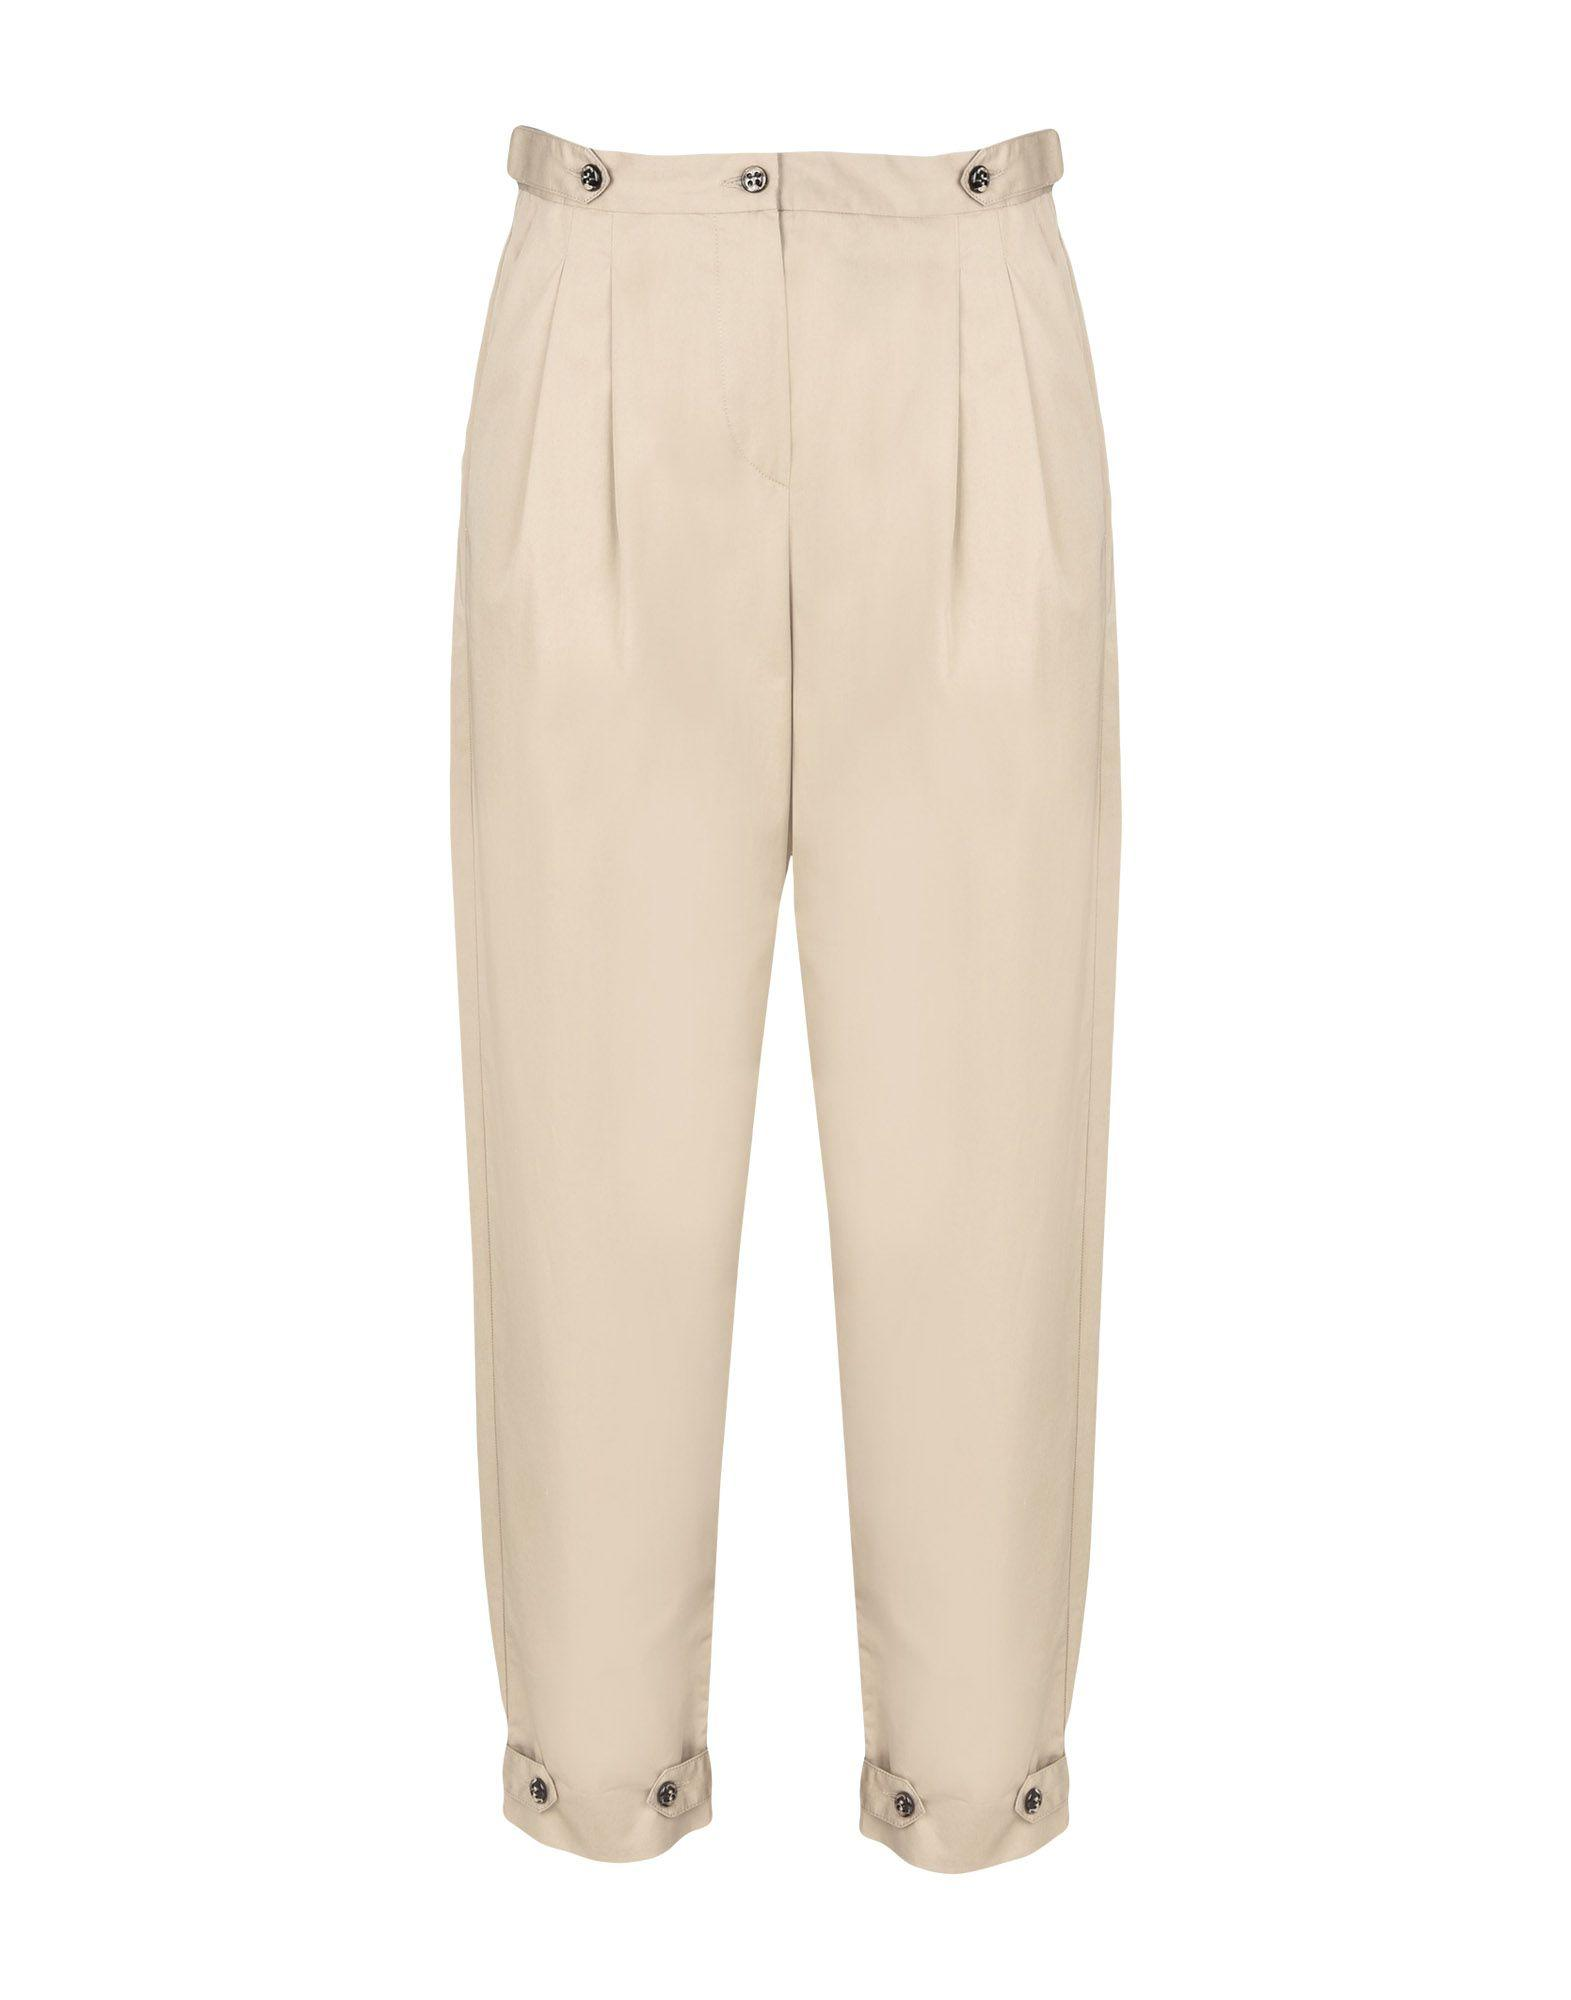 Emporio Armani Casual Pants In Beige